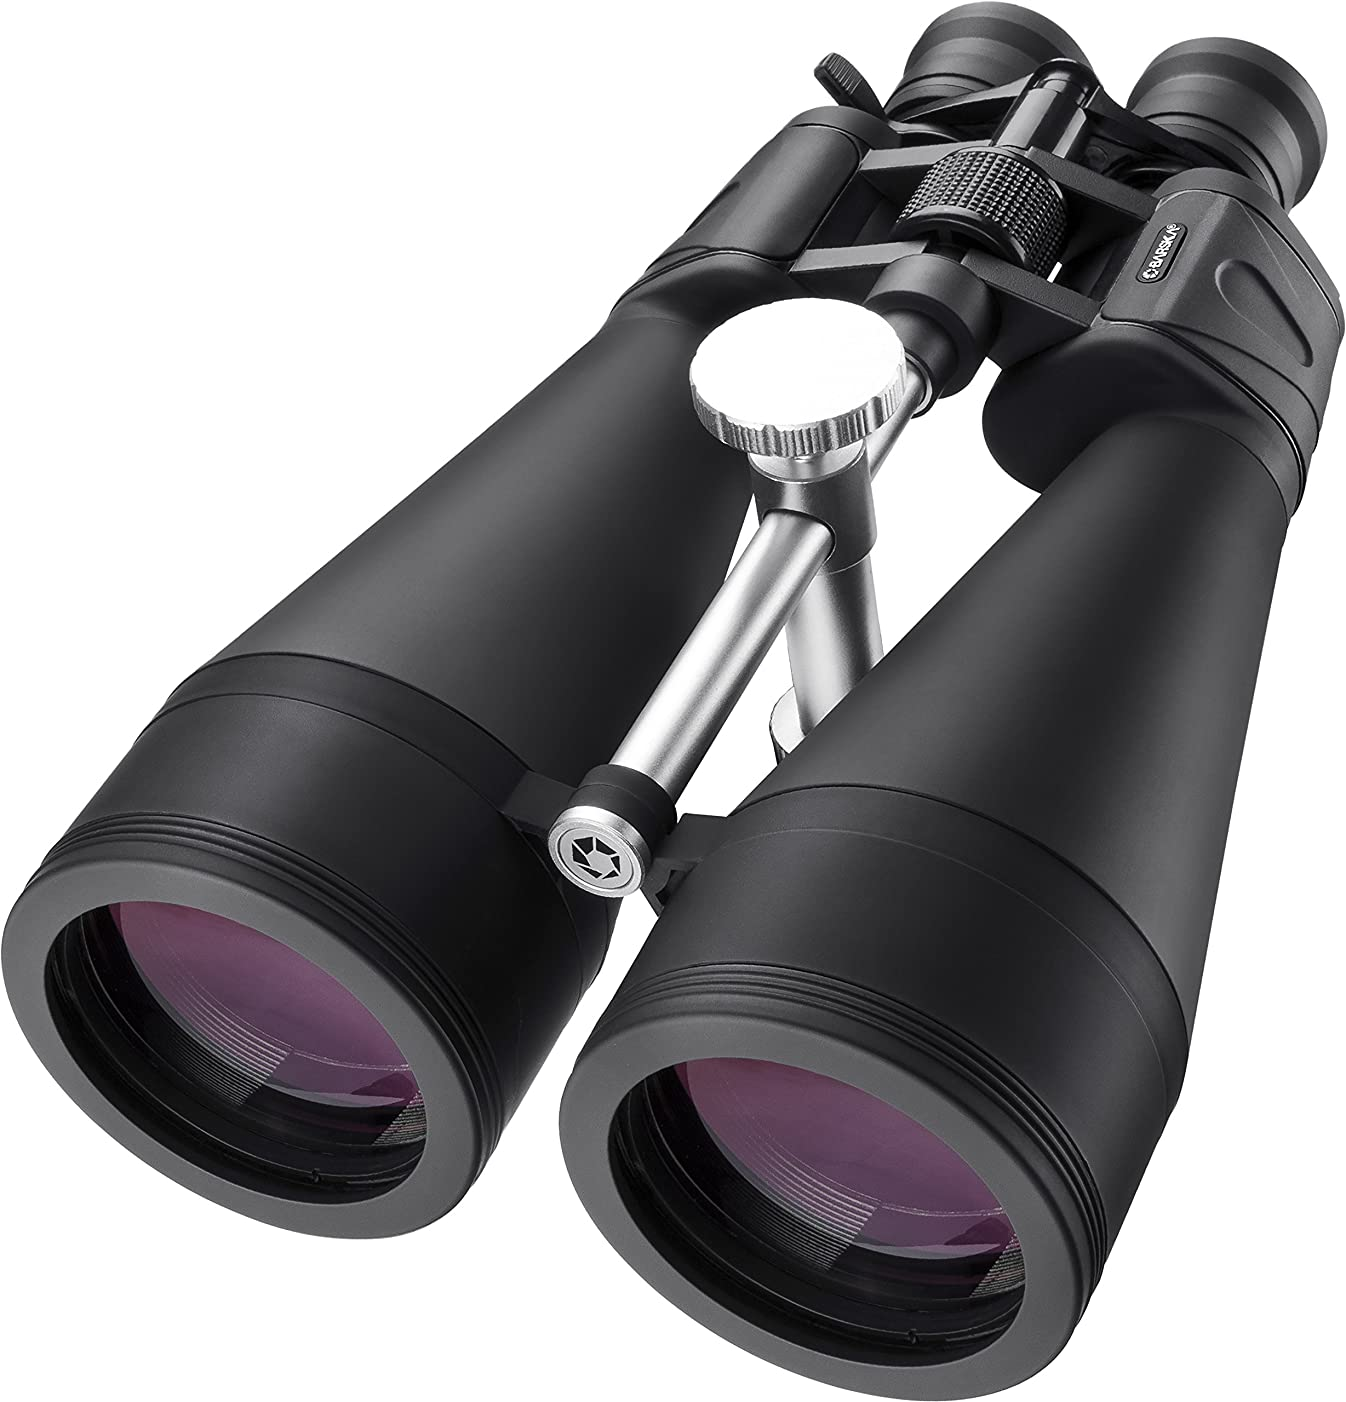 BARSKA Binoculars 20-140x80mm BAK-4 Porro Prisms Waterproof Fog Proof Optics